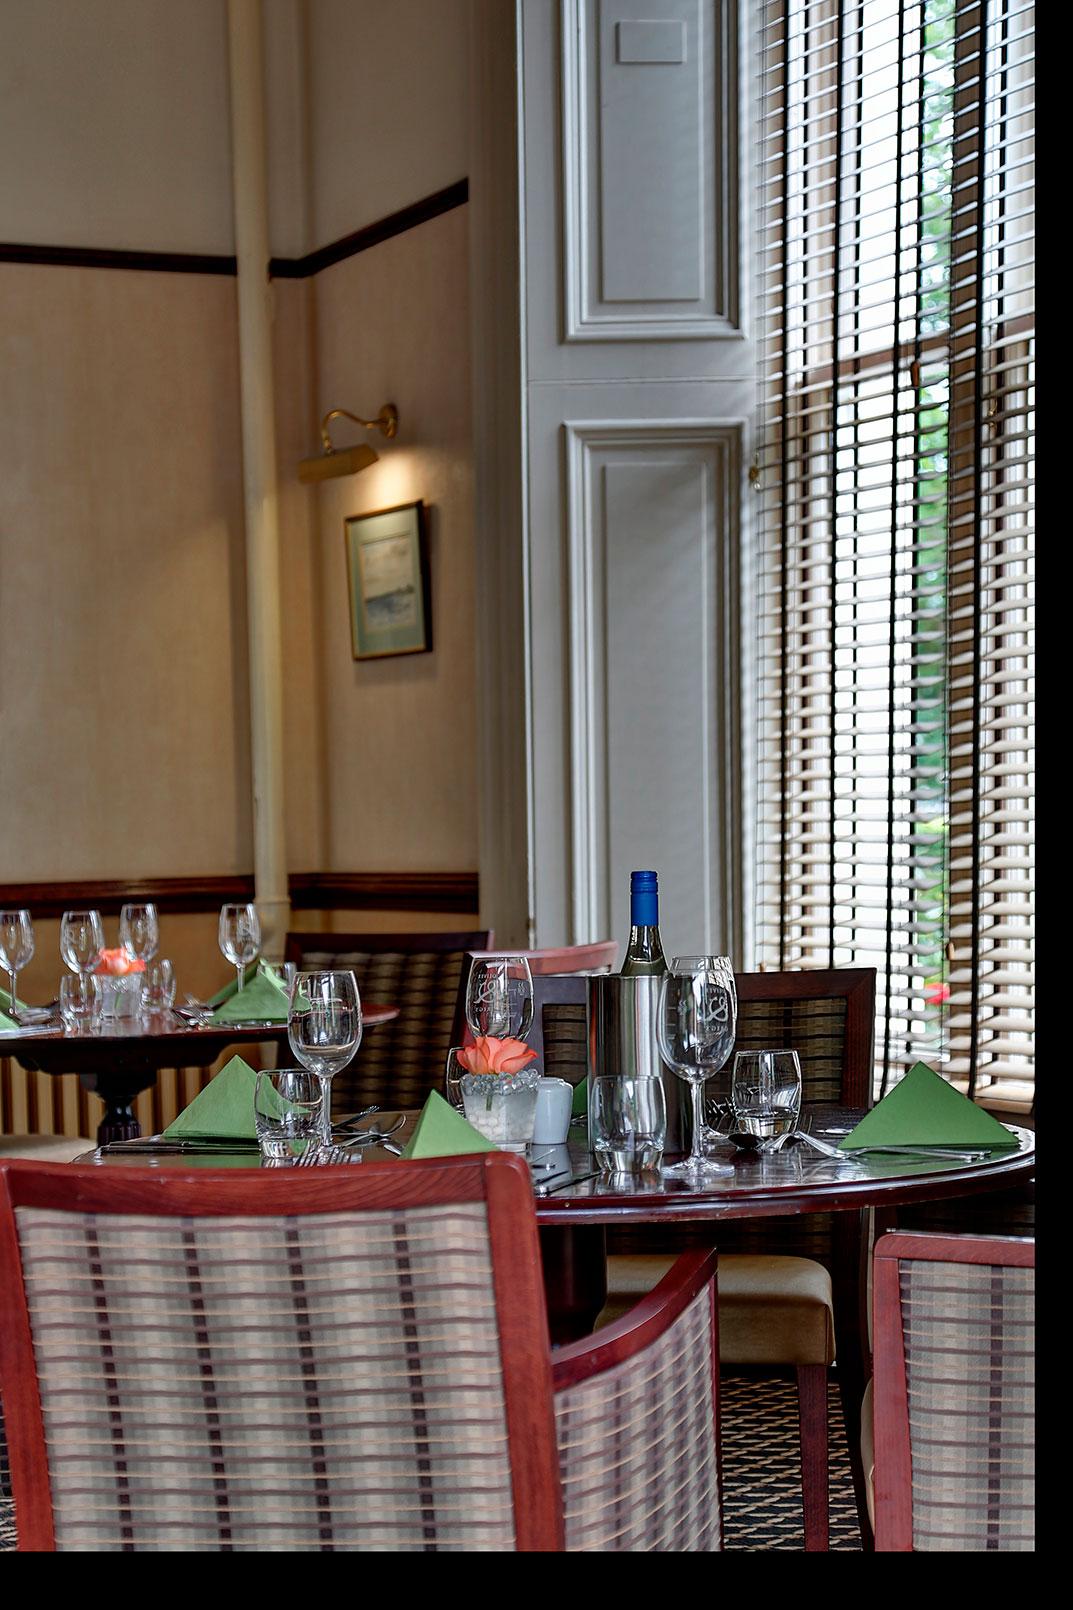 Best Western Hotel Room: Best Western Dundee Woodlands Hotel